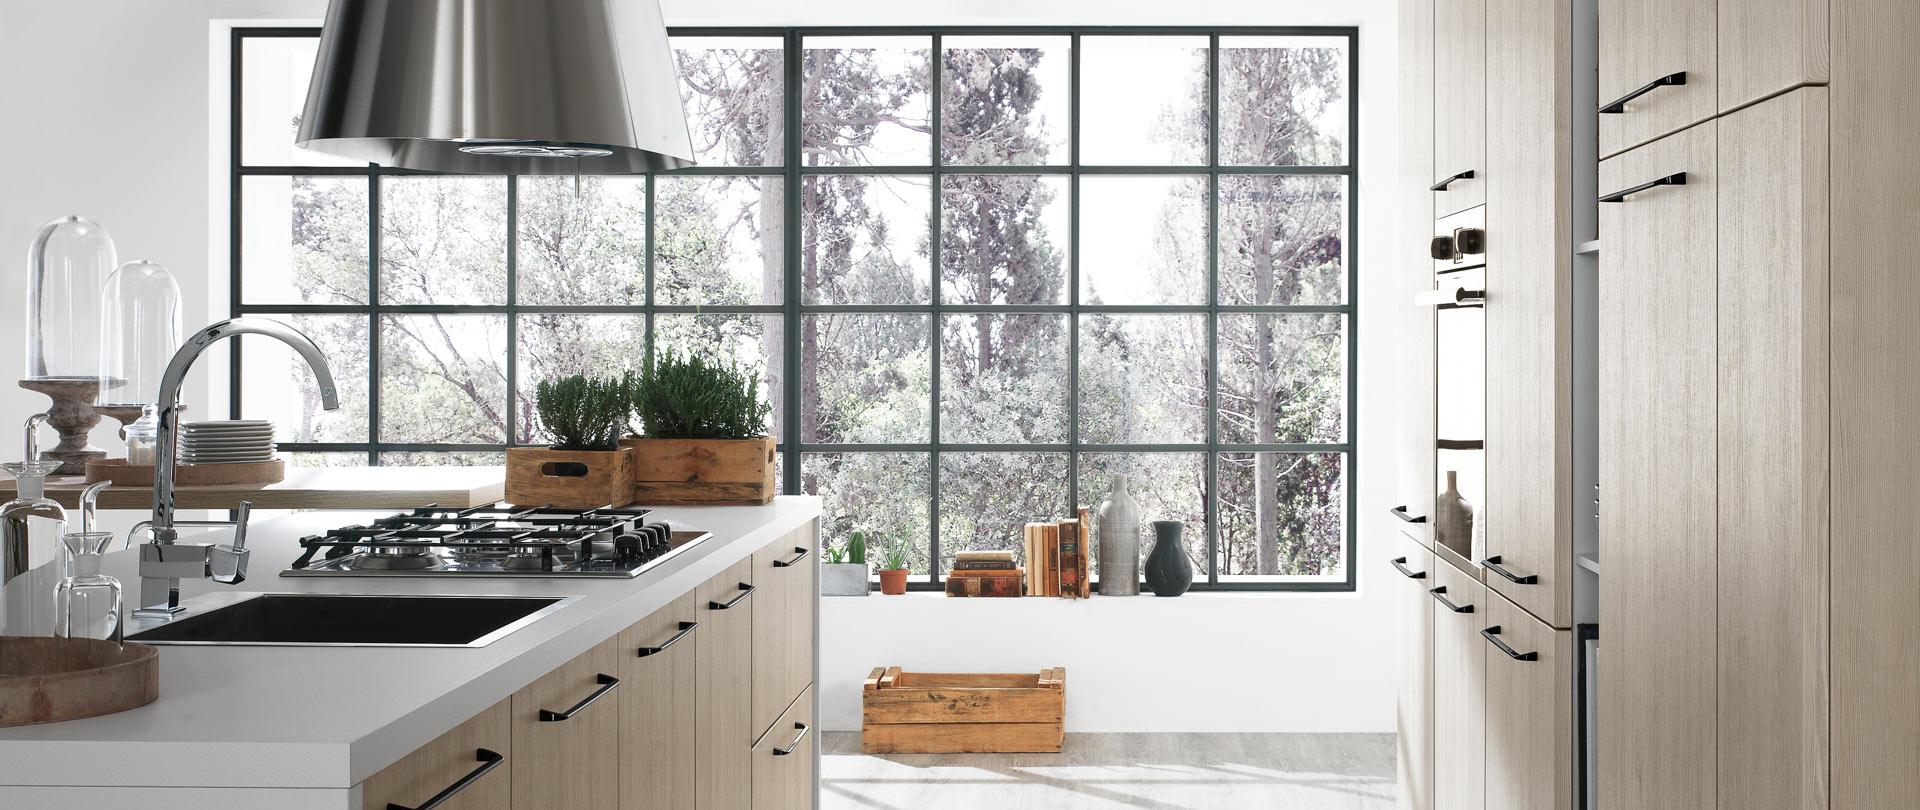 03-evo-cucina-aurora_rovere-beige